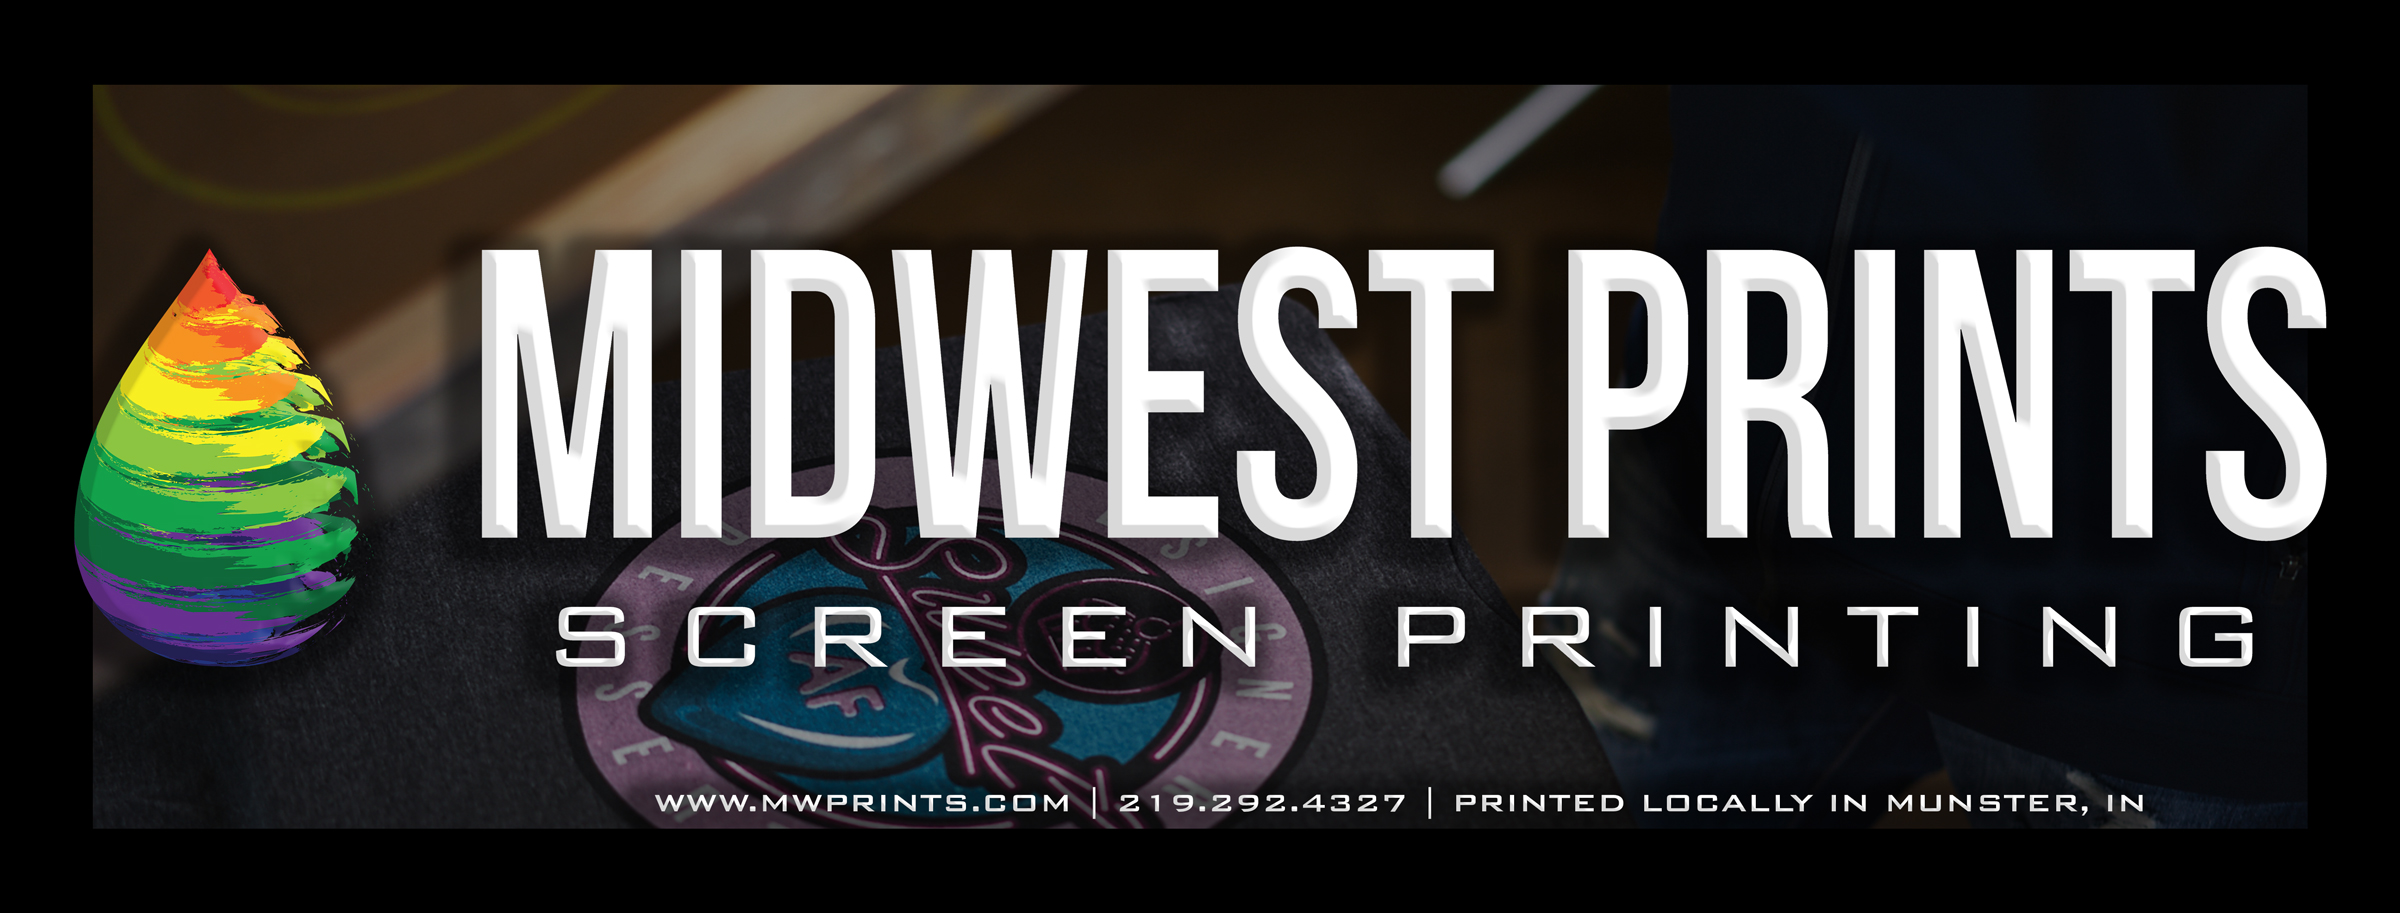 Midwest Prints - Screen Printing - FREE Printing